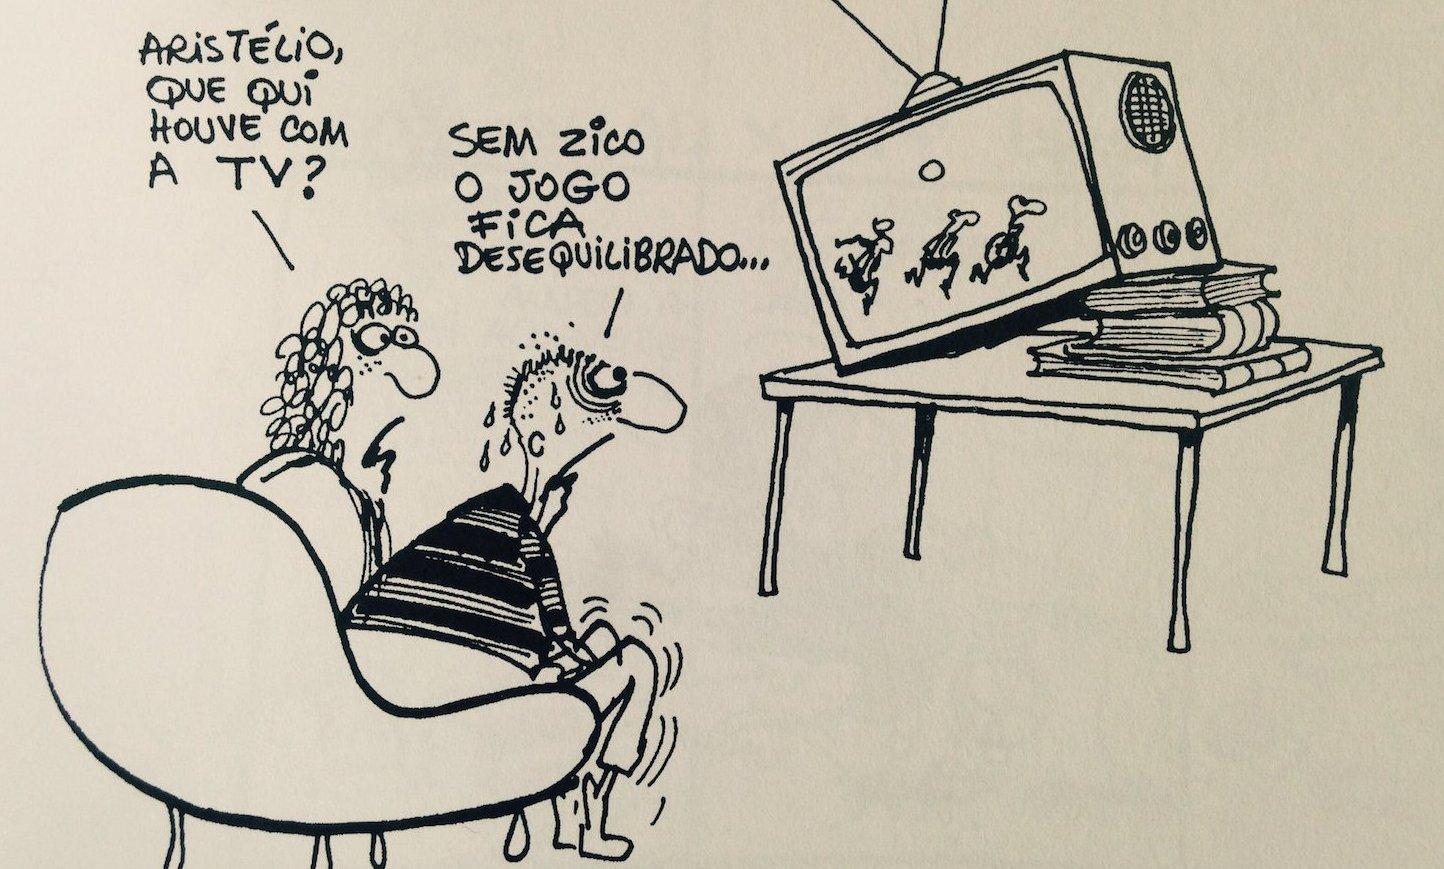 Henfil cartum Flamengo zico